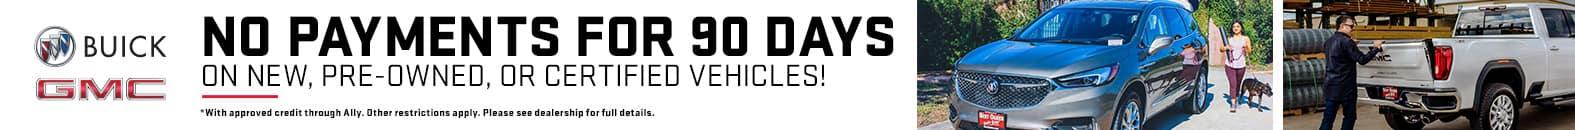 No Payments For 90 Days At Bert Ogden Buick GMC   Edinburg, TX